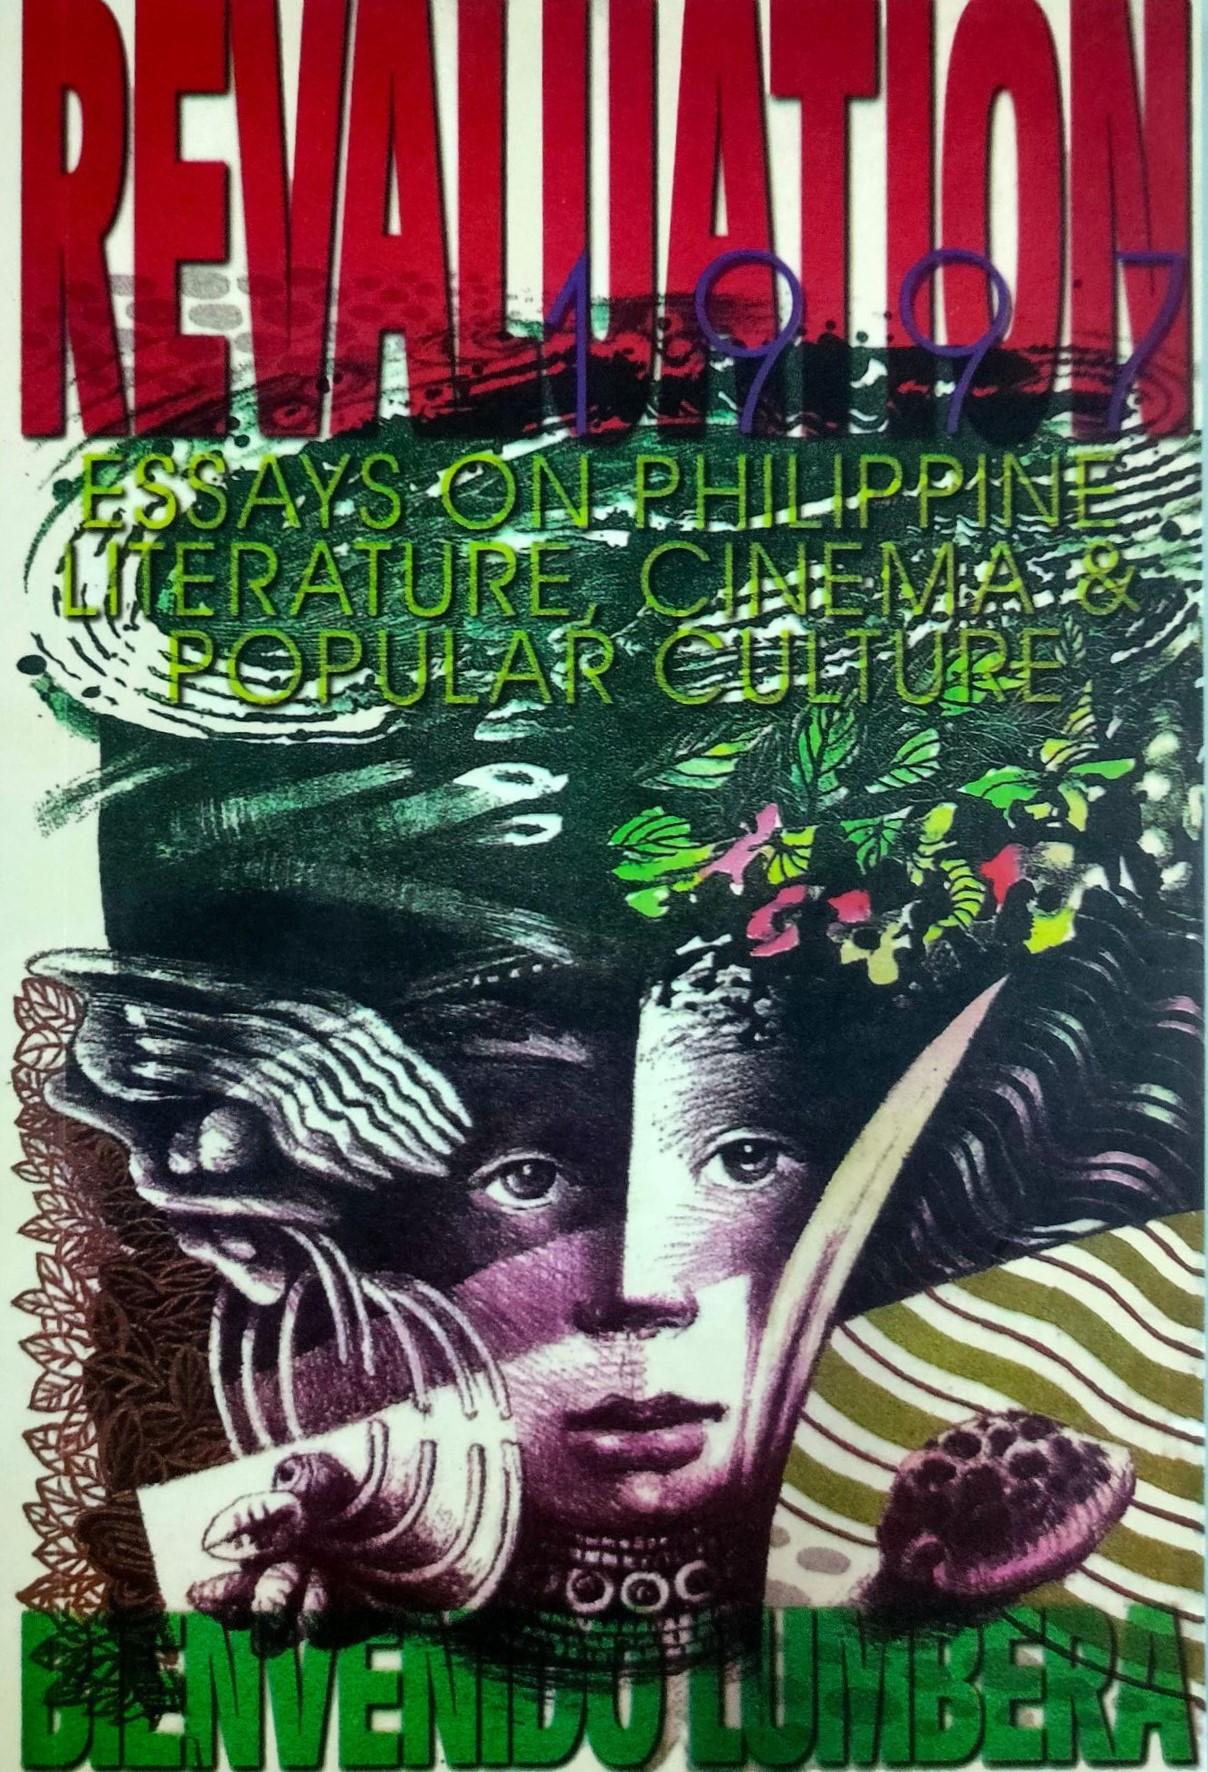 Revaluation 1997: Essays on Philippine Literature, Cinema, and Popular Culture